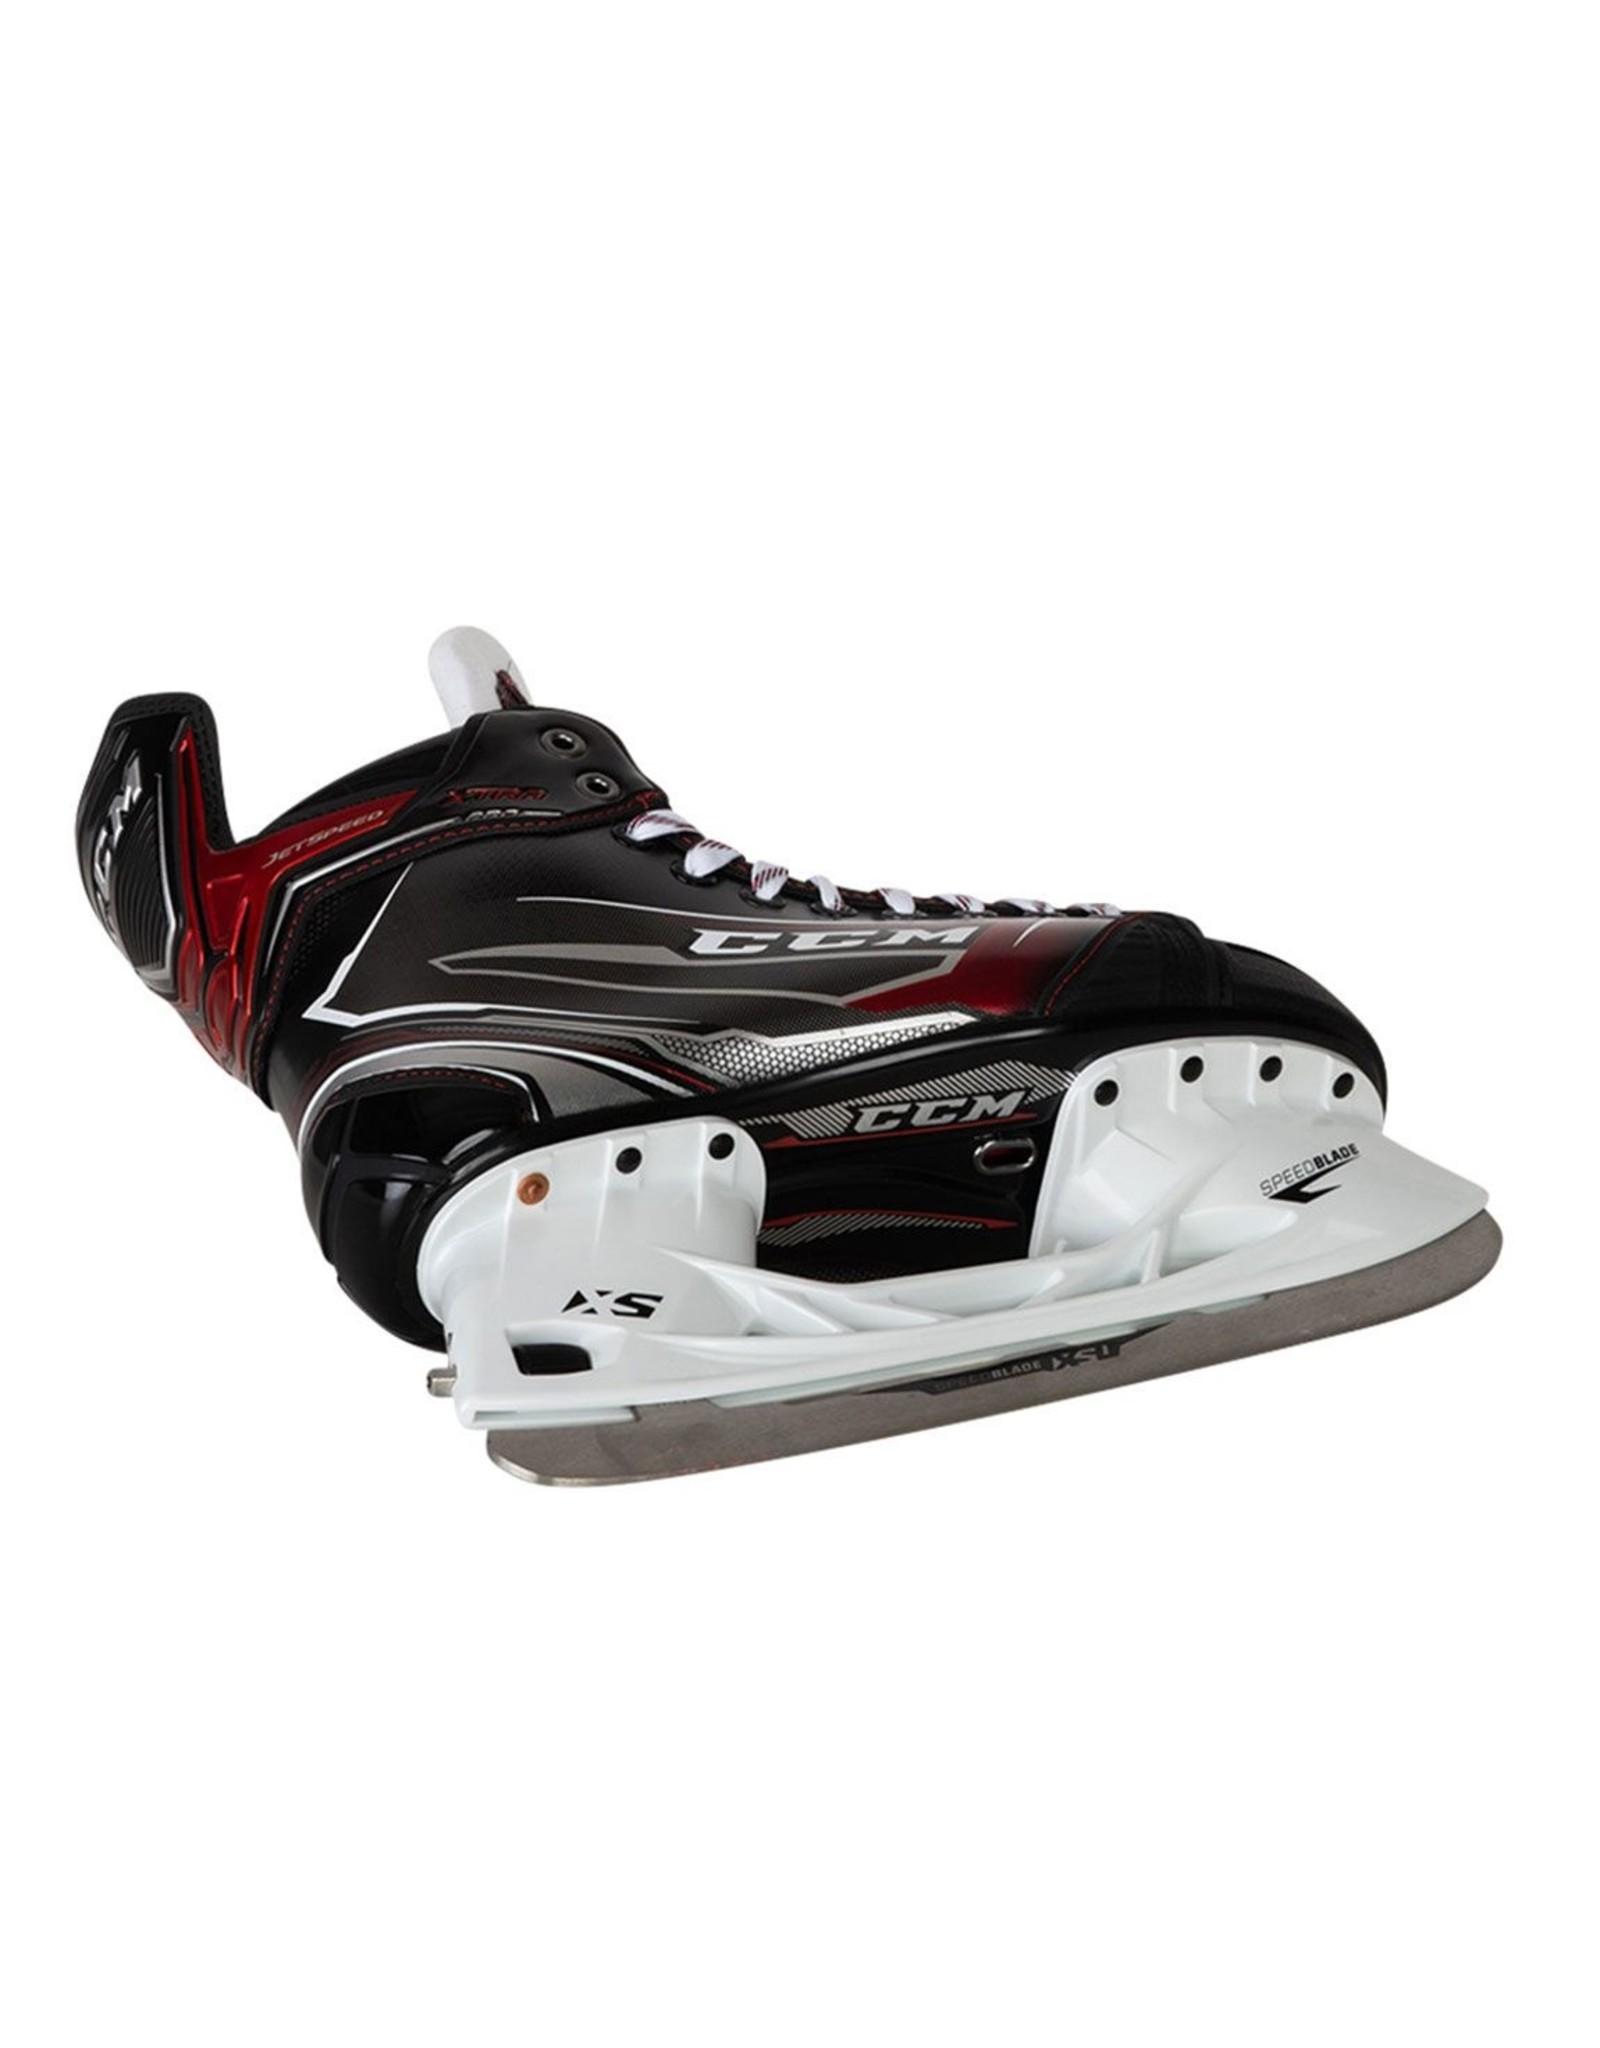 CCM Hockey (Canada) CCM JETSPEED XTRA PRO SKATE '19 - JR